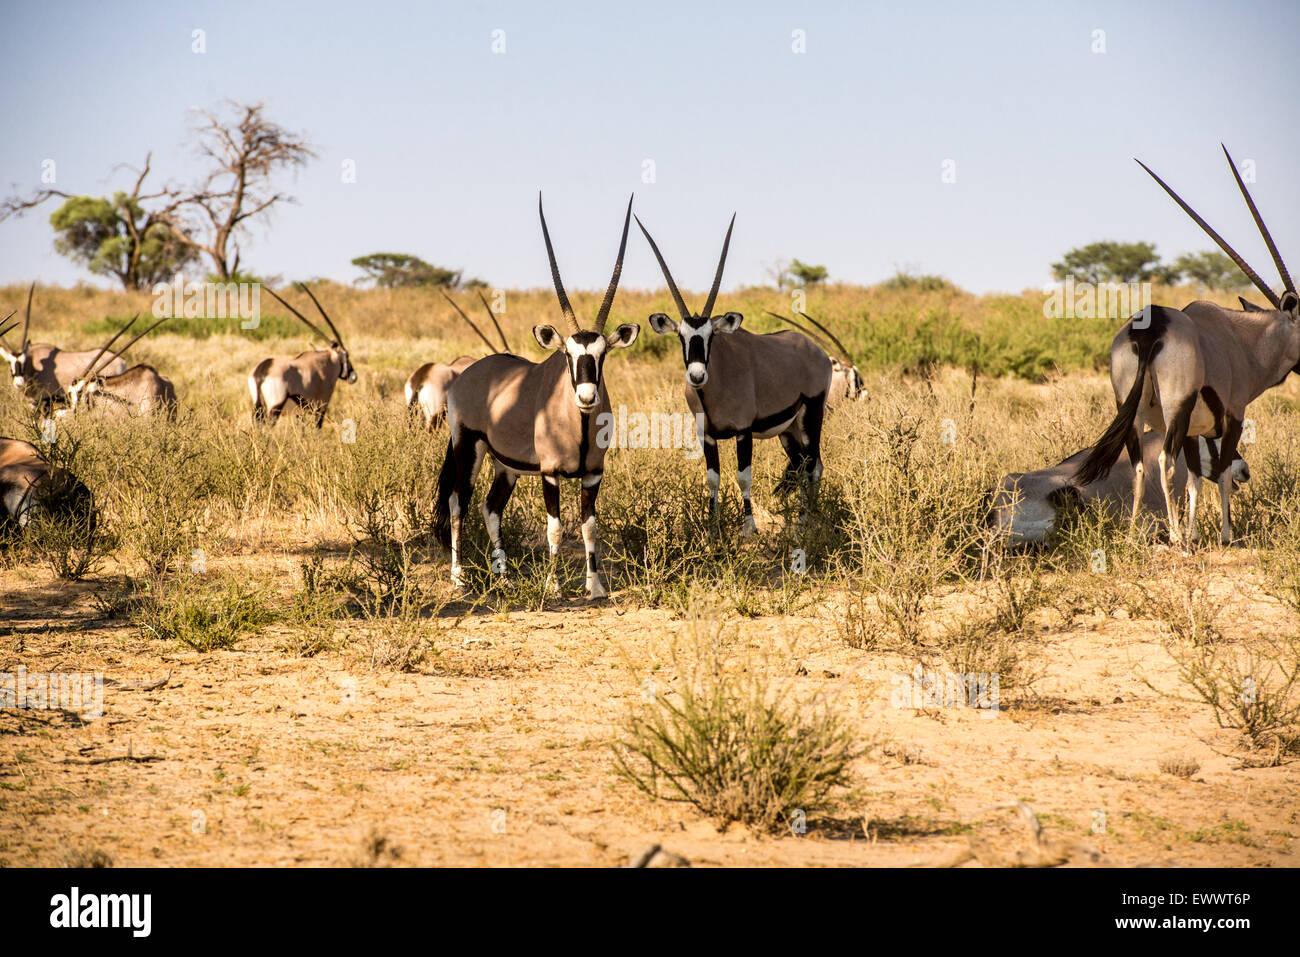 South Africa - Gemsbok in Khalagadi Transfrontier Park - Stock Image